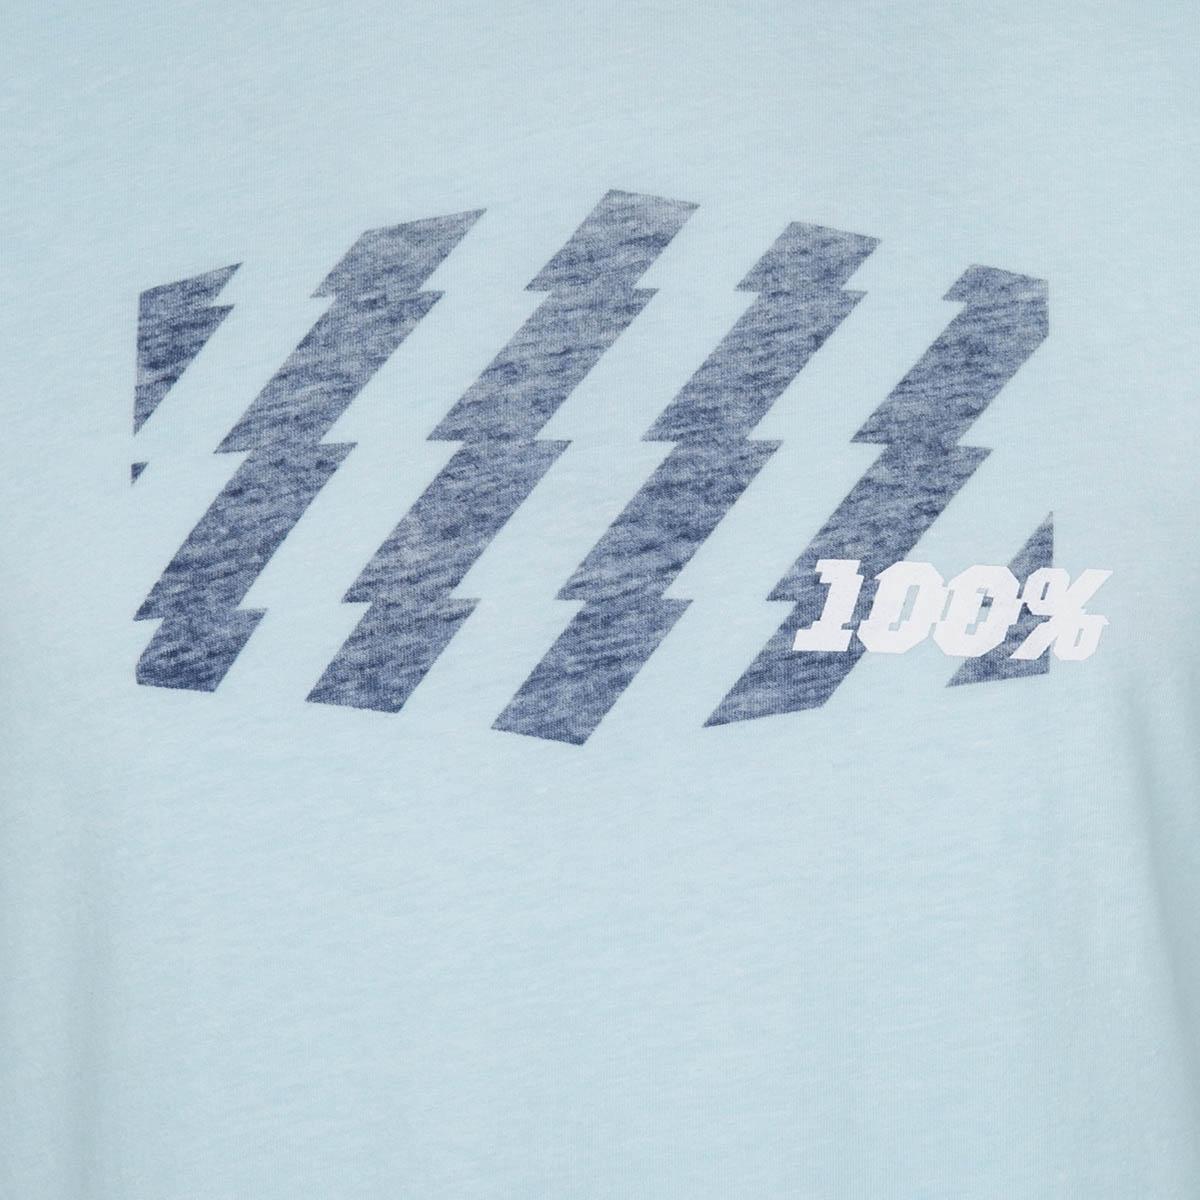 100% T-Shirt Strike Ice Ice Ice Blau | New Product 2019  | Verschiedene Stile  72b9d5